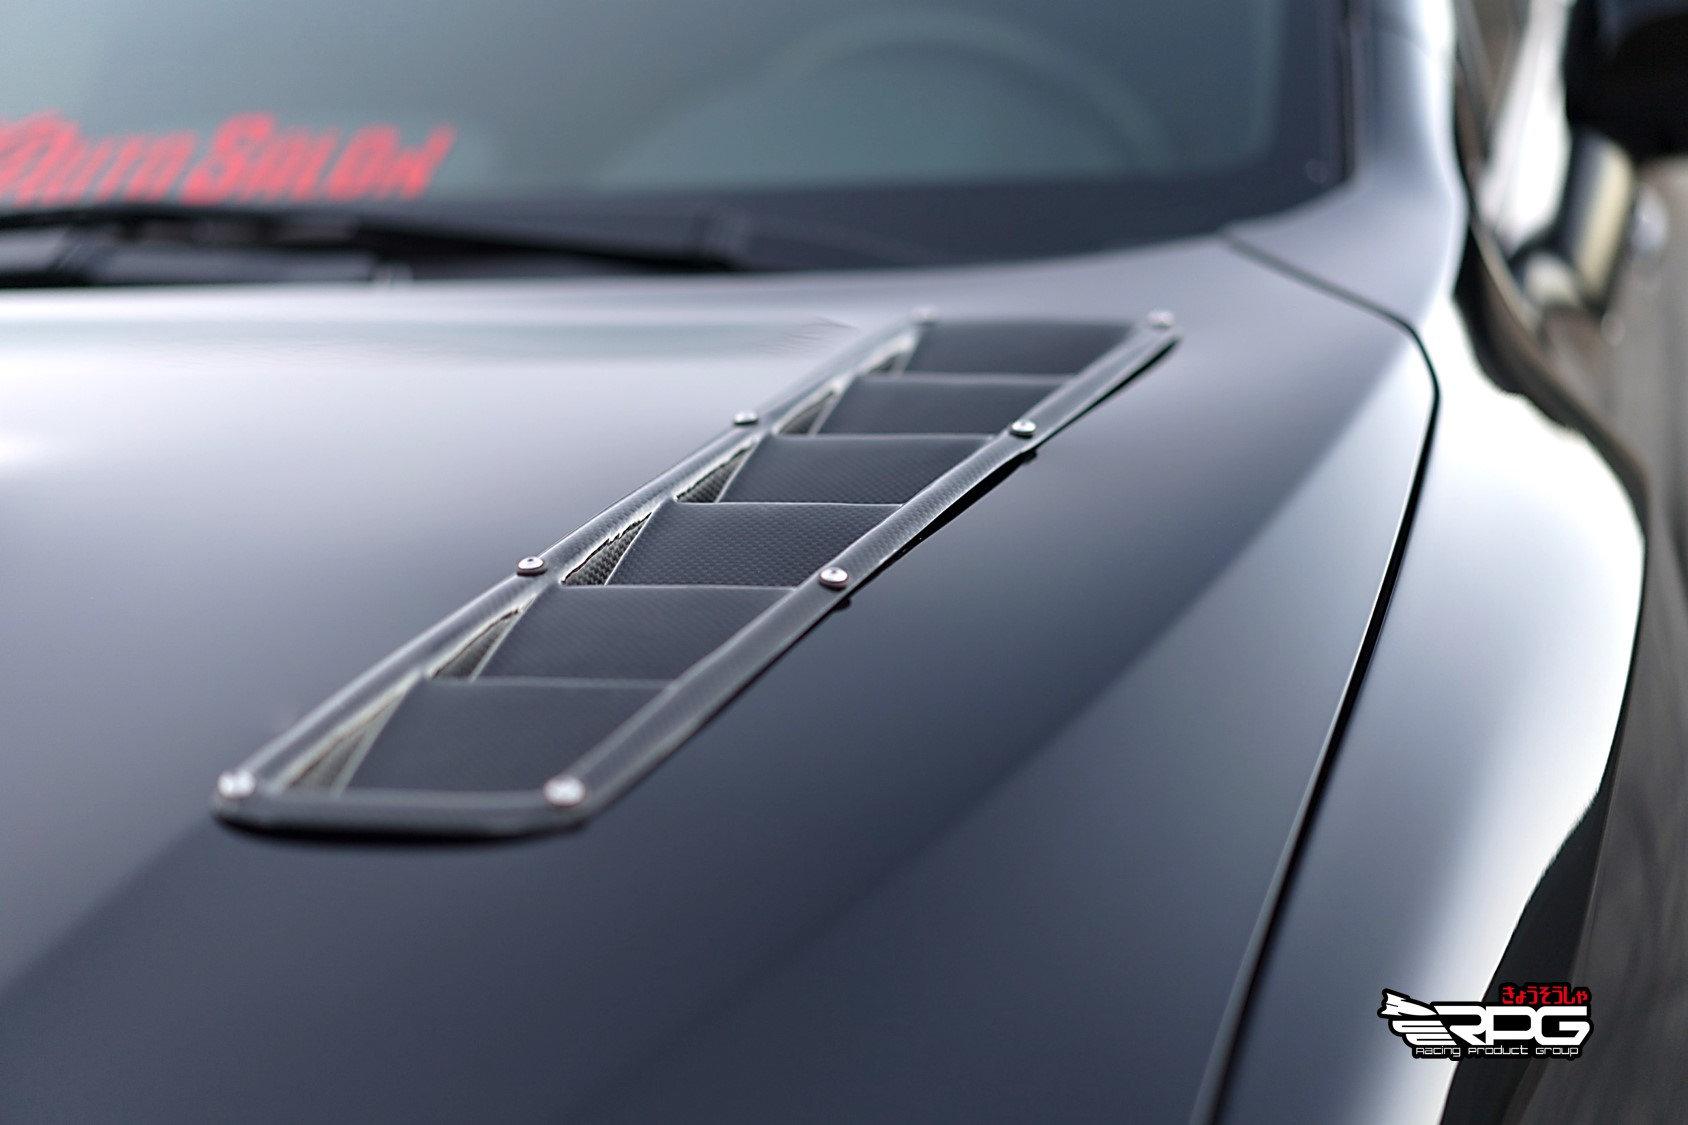 RPG RR Honeycomb Carbon Hood Vent for 02 03 04 05 06 07 Subaru Impreza WRX STi